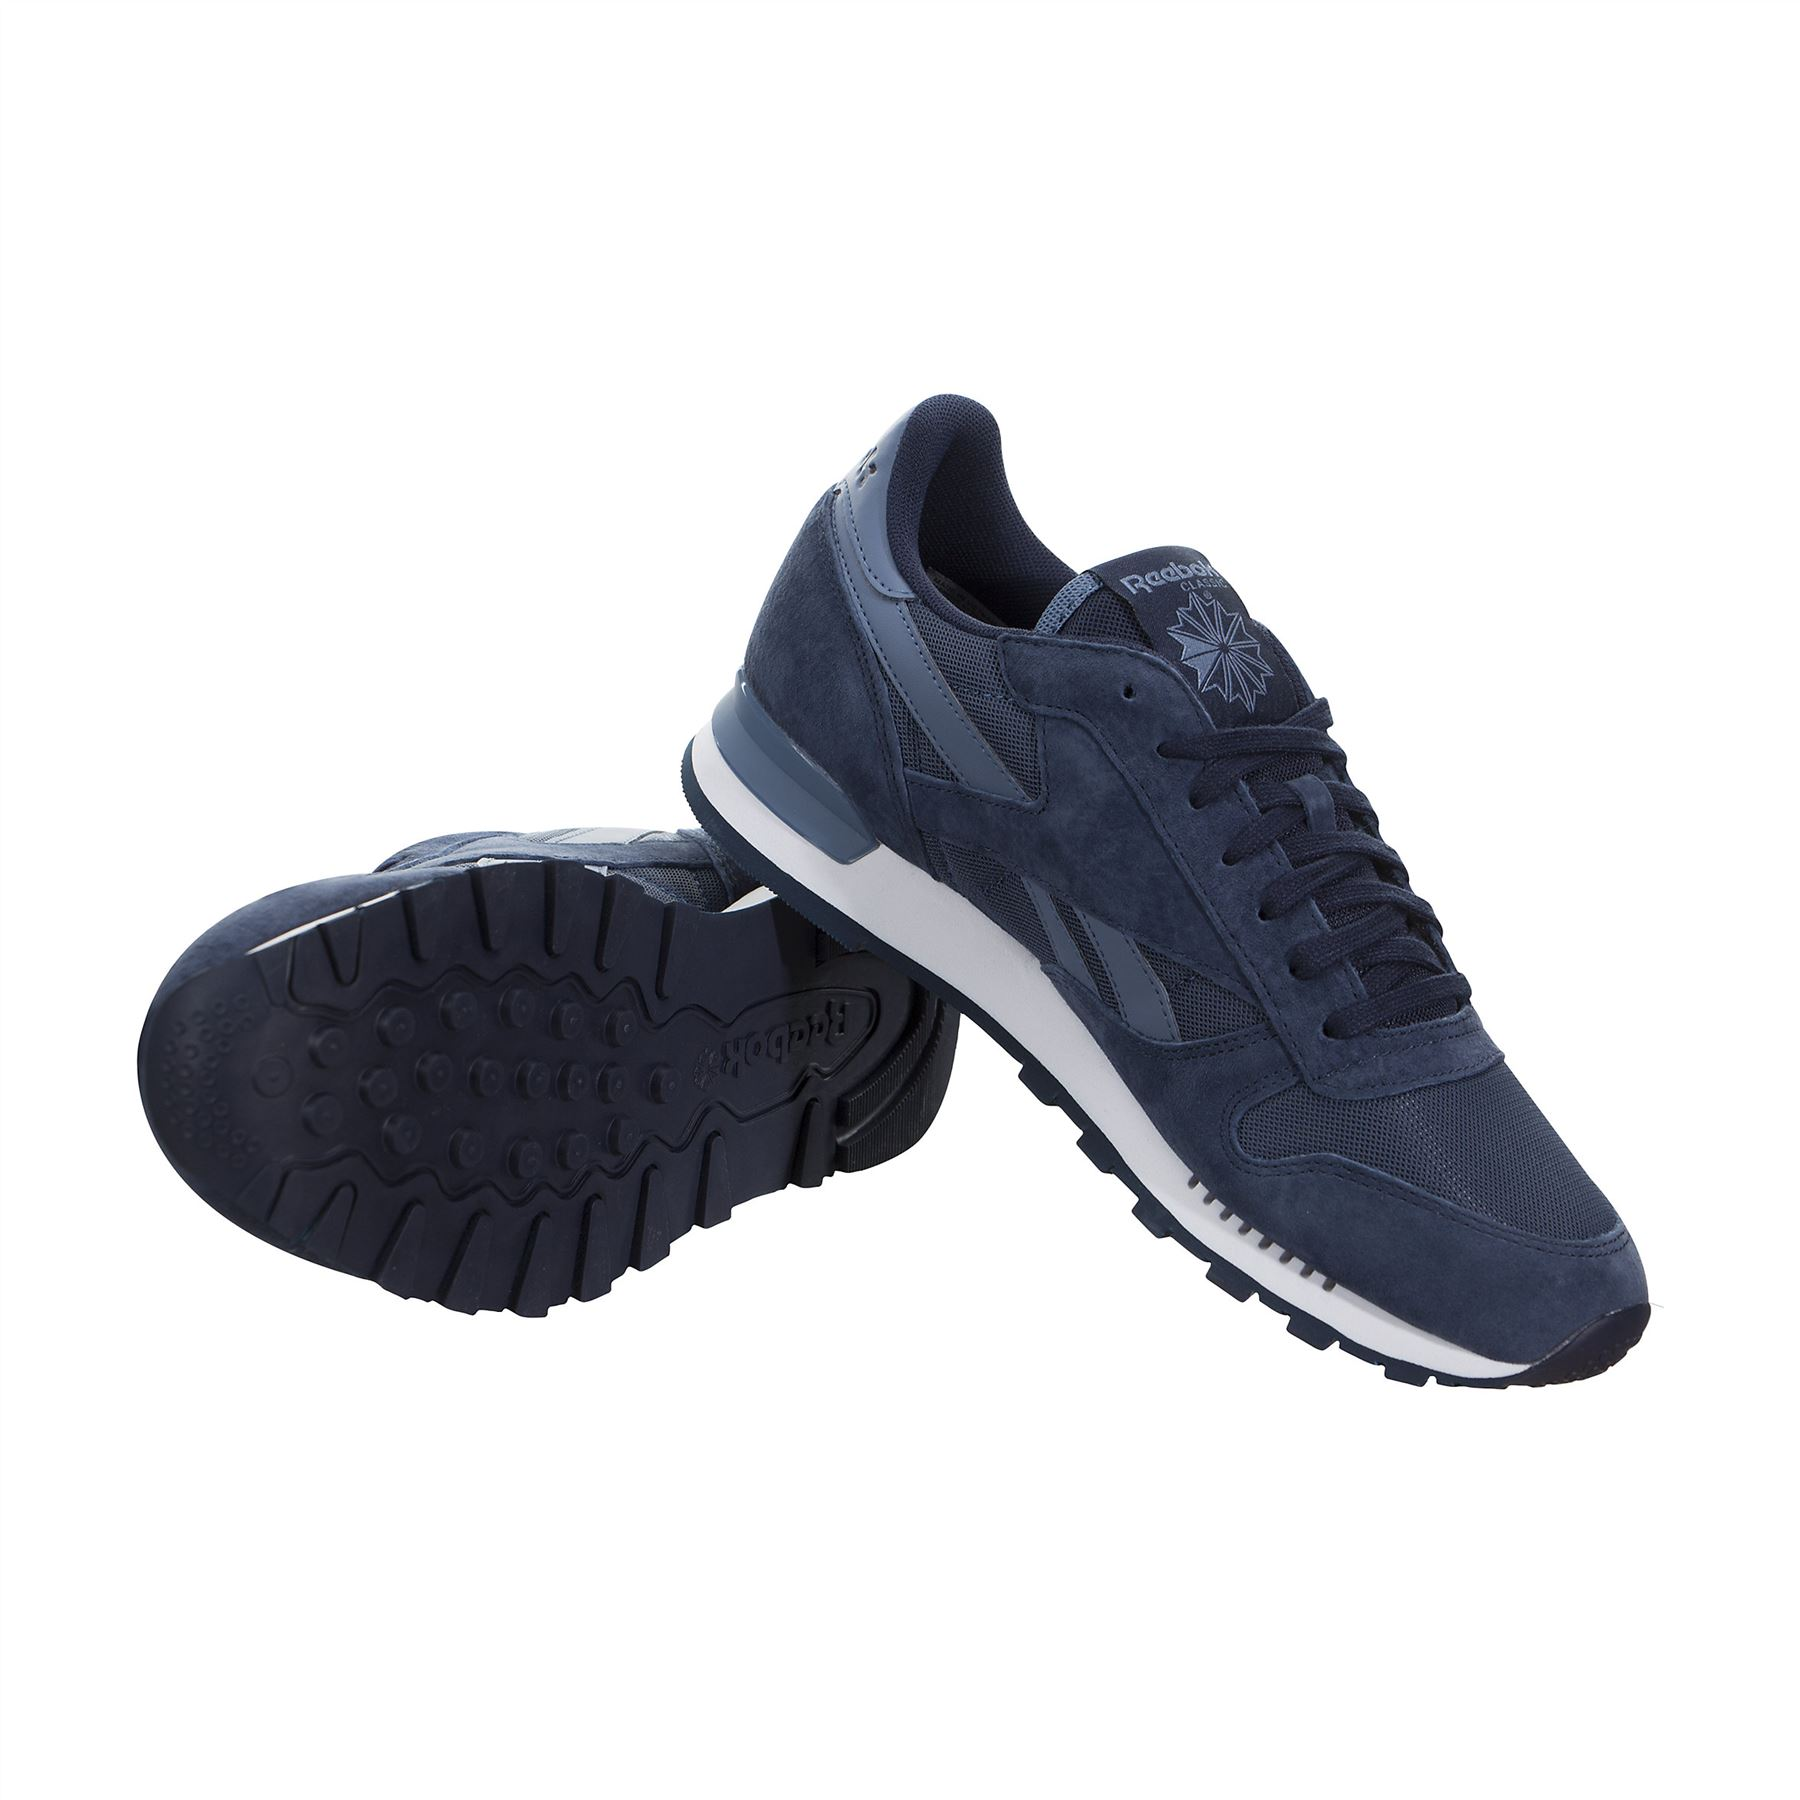 d8b8ecc6ff2 ... Reebok Classic Leather Clip Elements Trainers Mens Sneakers Shoes  Footwear